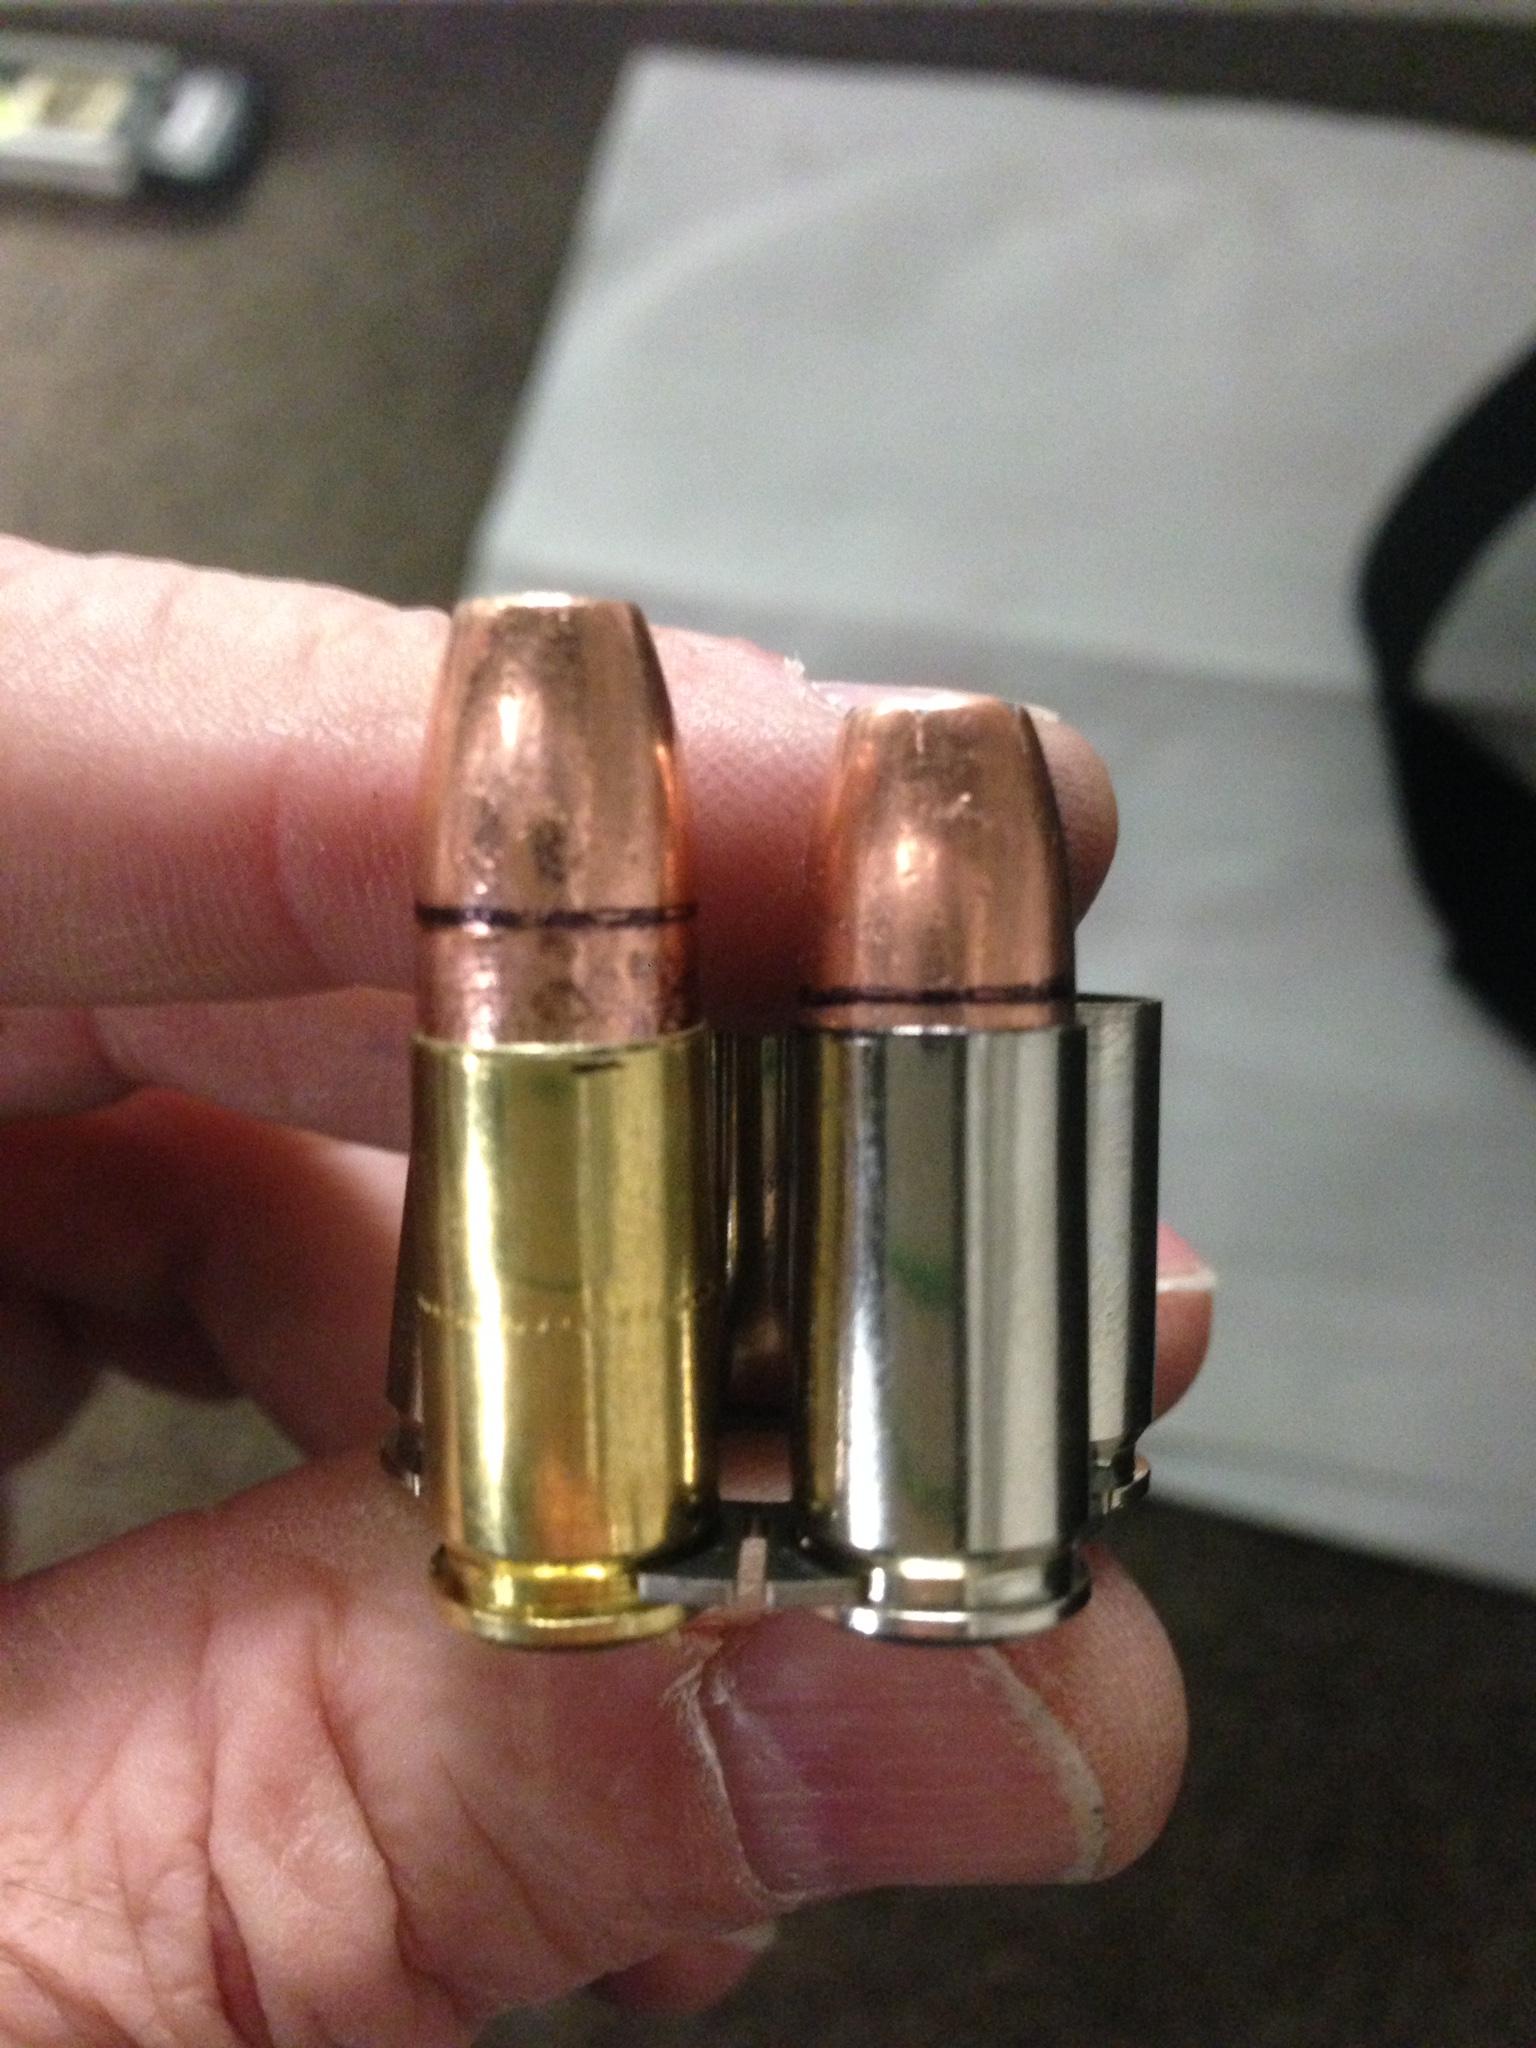 LCR compared to the SP101 in .9mm-2103ec0b-1a76-4901-8117-744daf51d335_1596072150340.jpeg